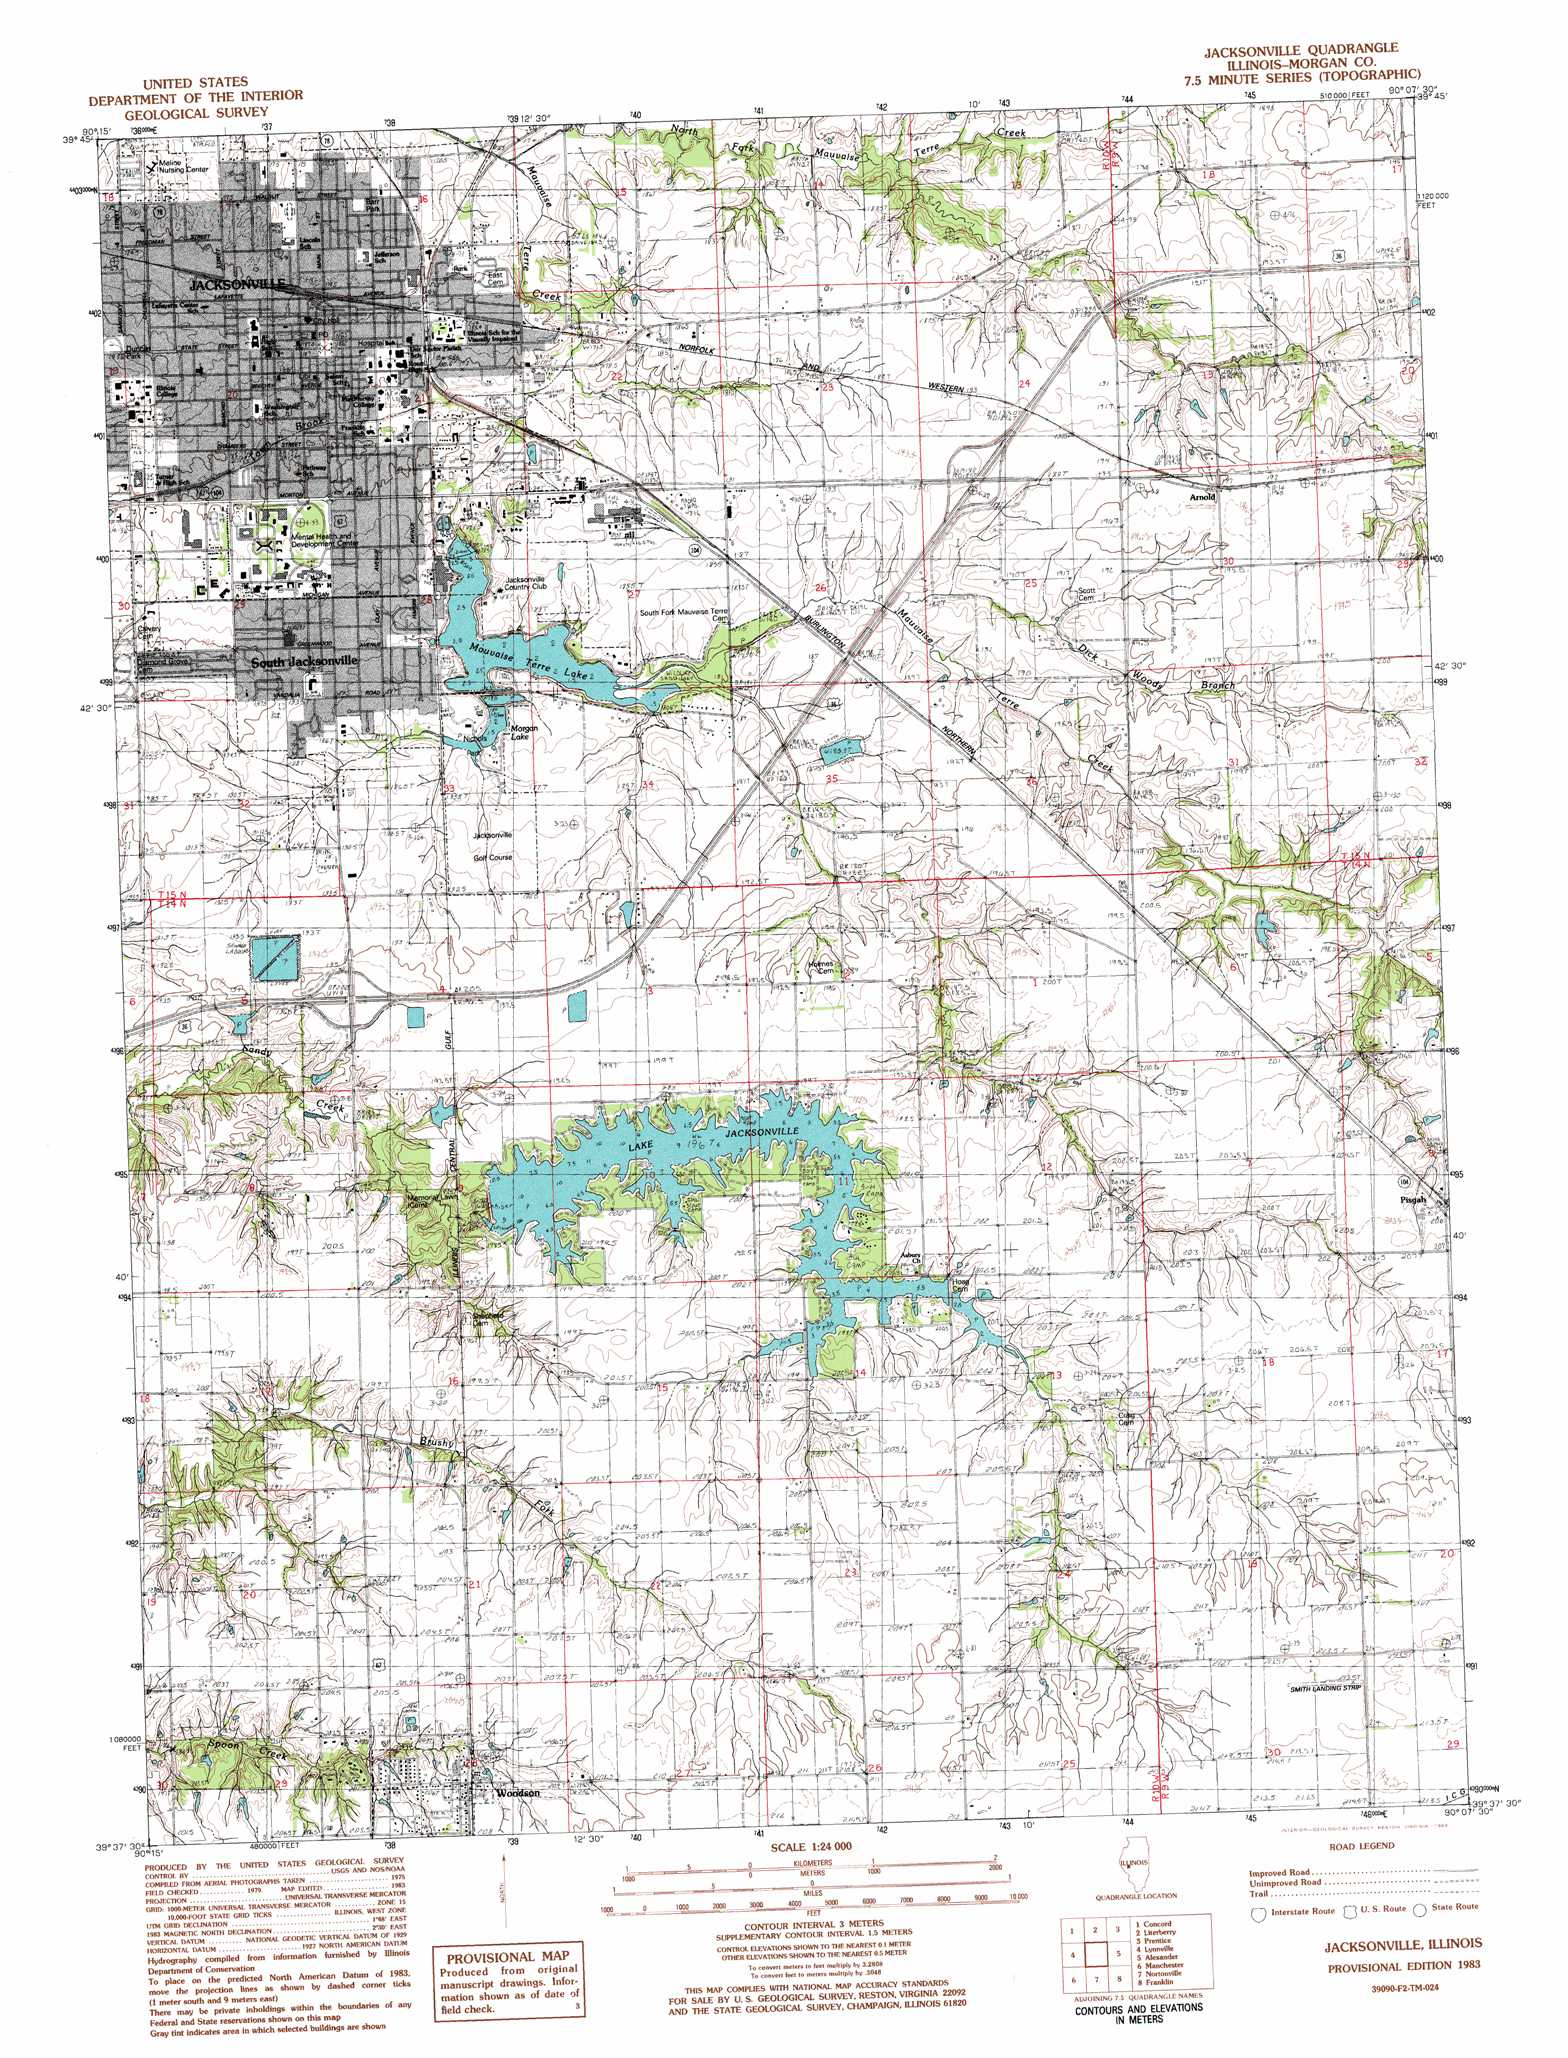 jacksonville topographic map il usgs topo quad 39090f2. Black Bedroom Furniture Sets. Home Design Ideas